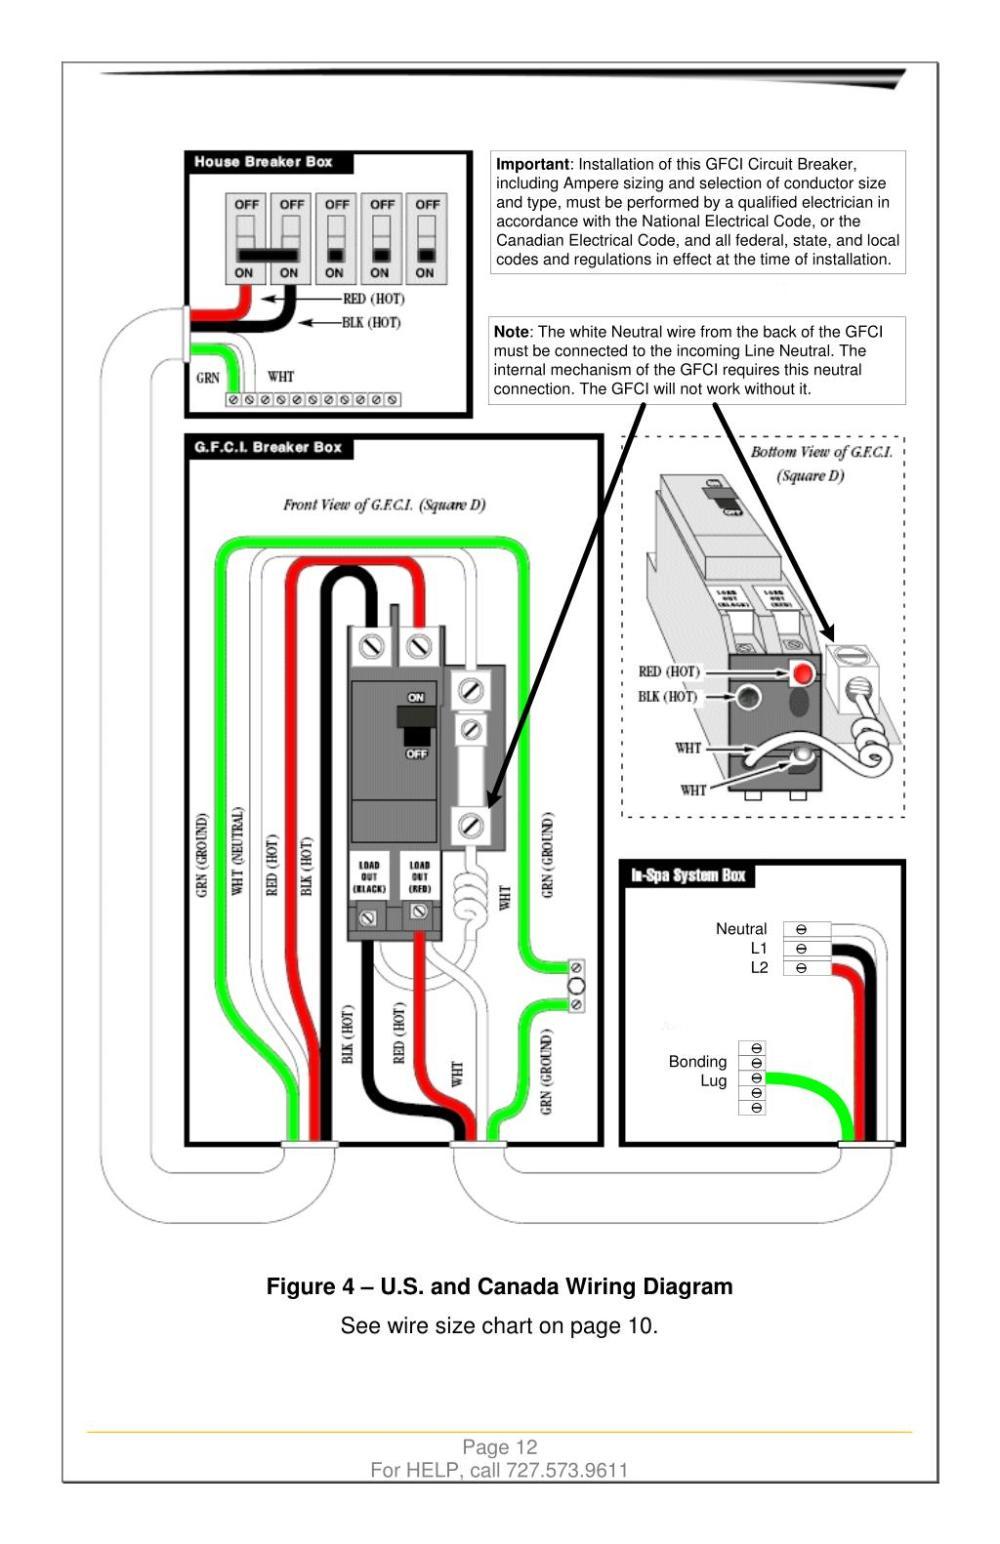 medium resolution of important installation of this gfci circuit breaker